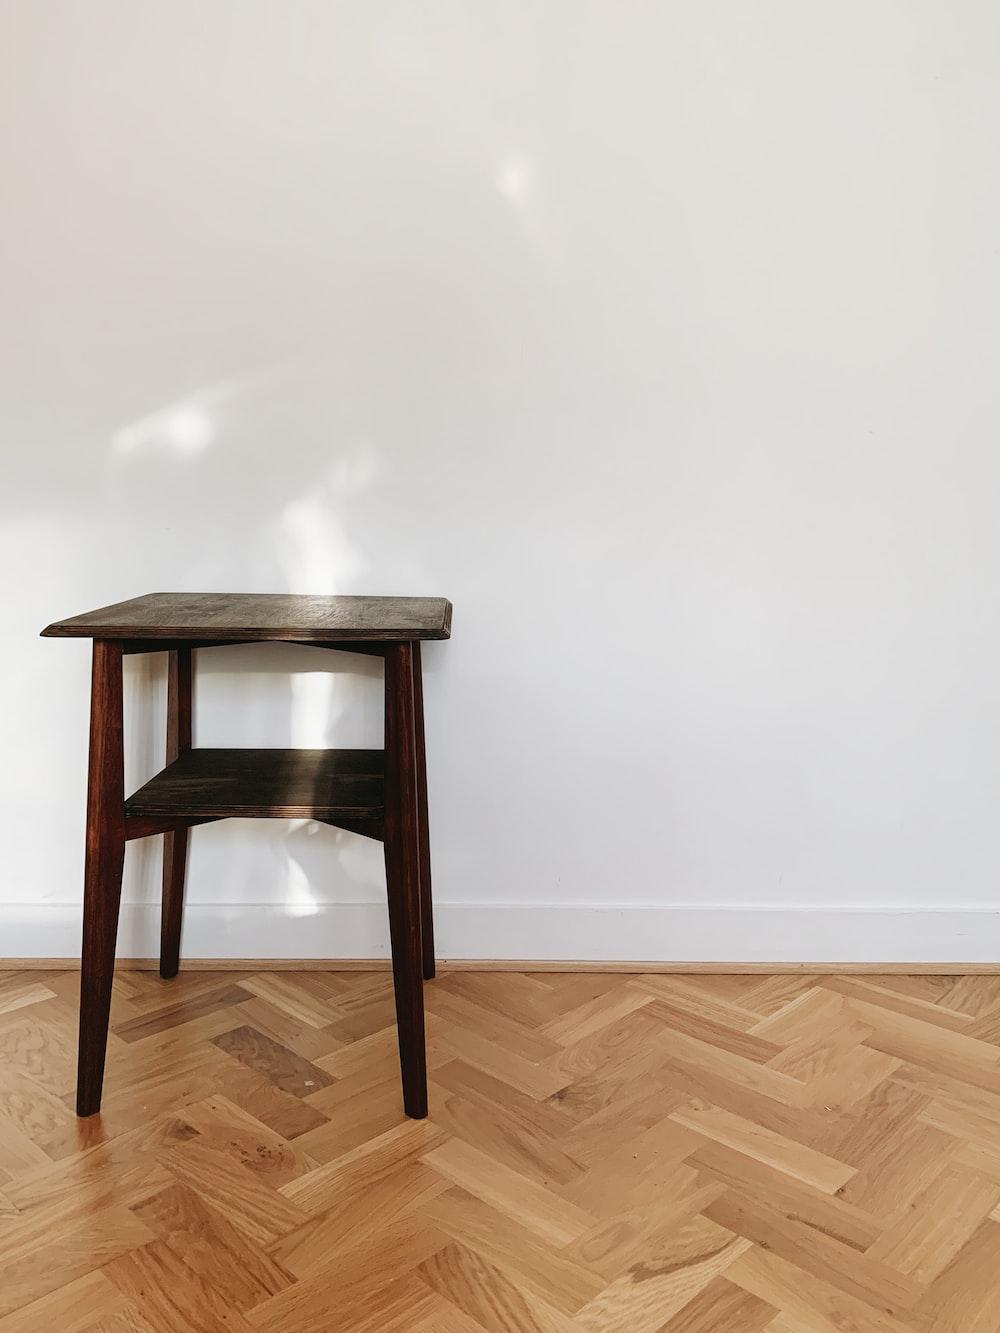 brown wooden seat on brown wooden parquet floor